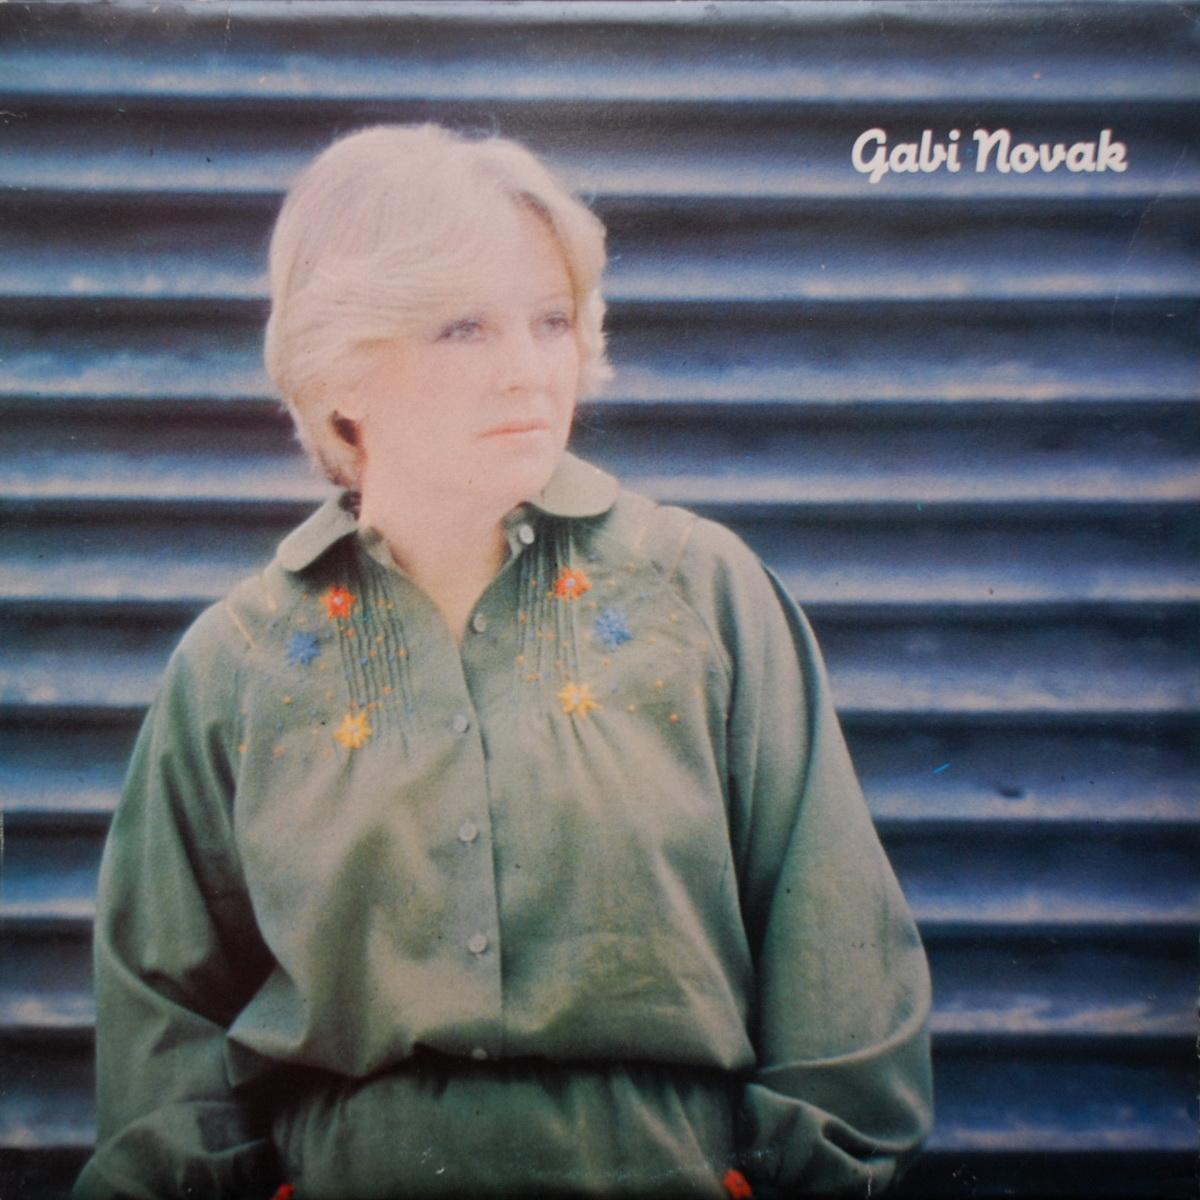 Gabi Novak 1982 Gabi Novak A